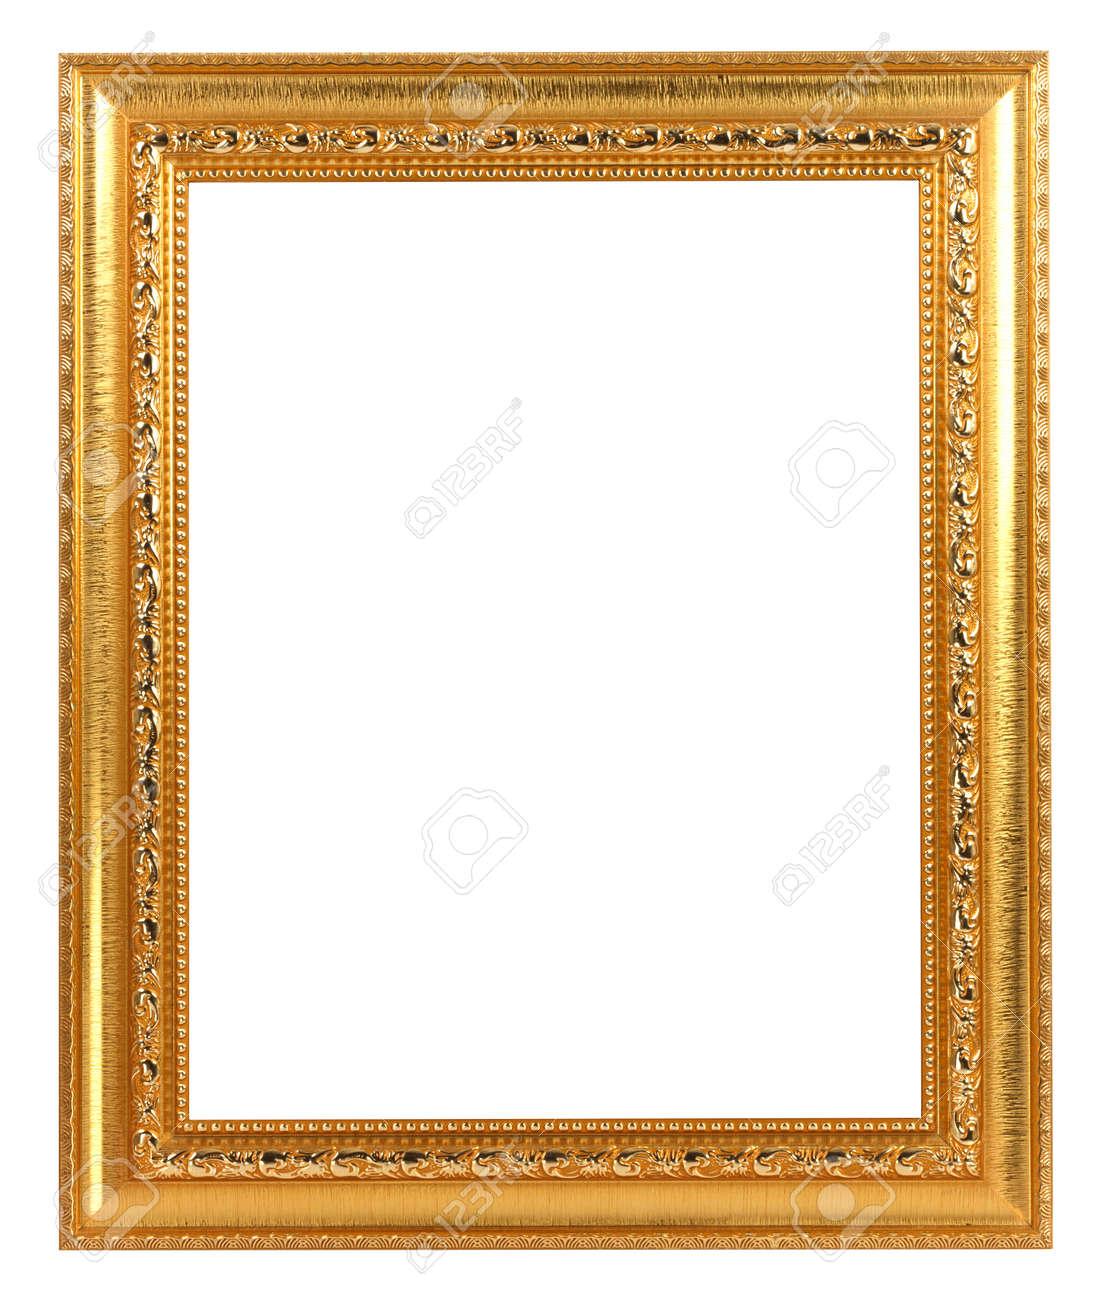 Gold Vintage Frame ISOLATED on White Background. - 125114219